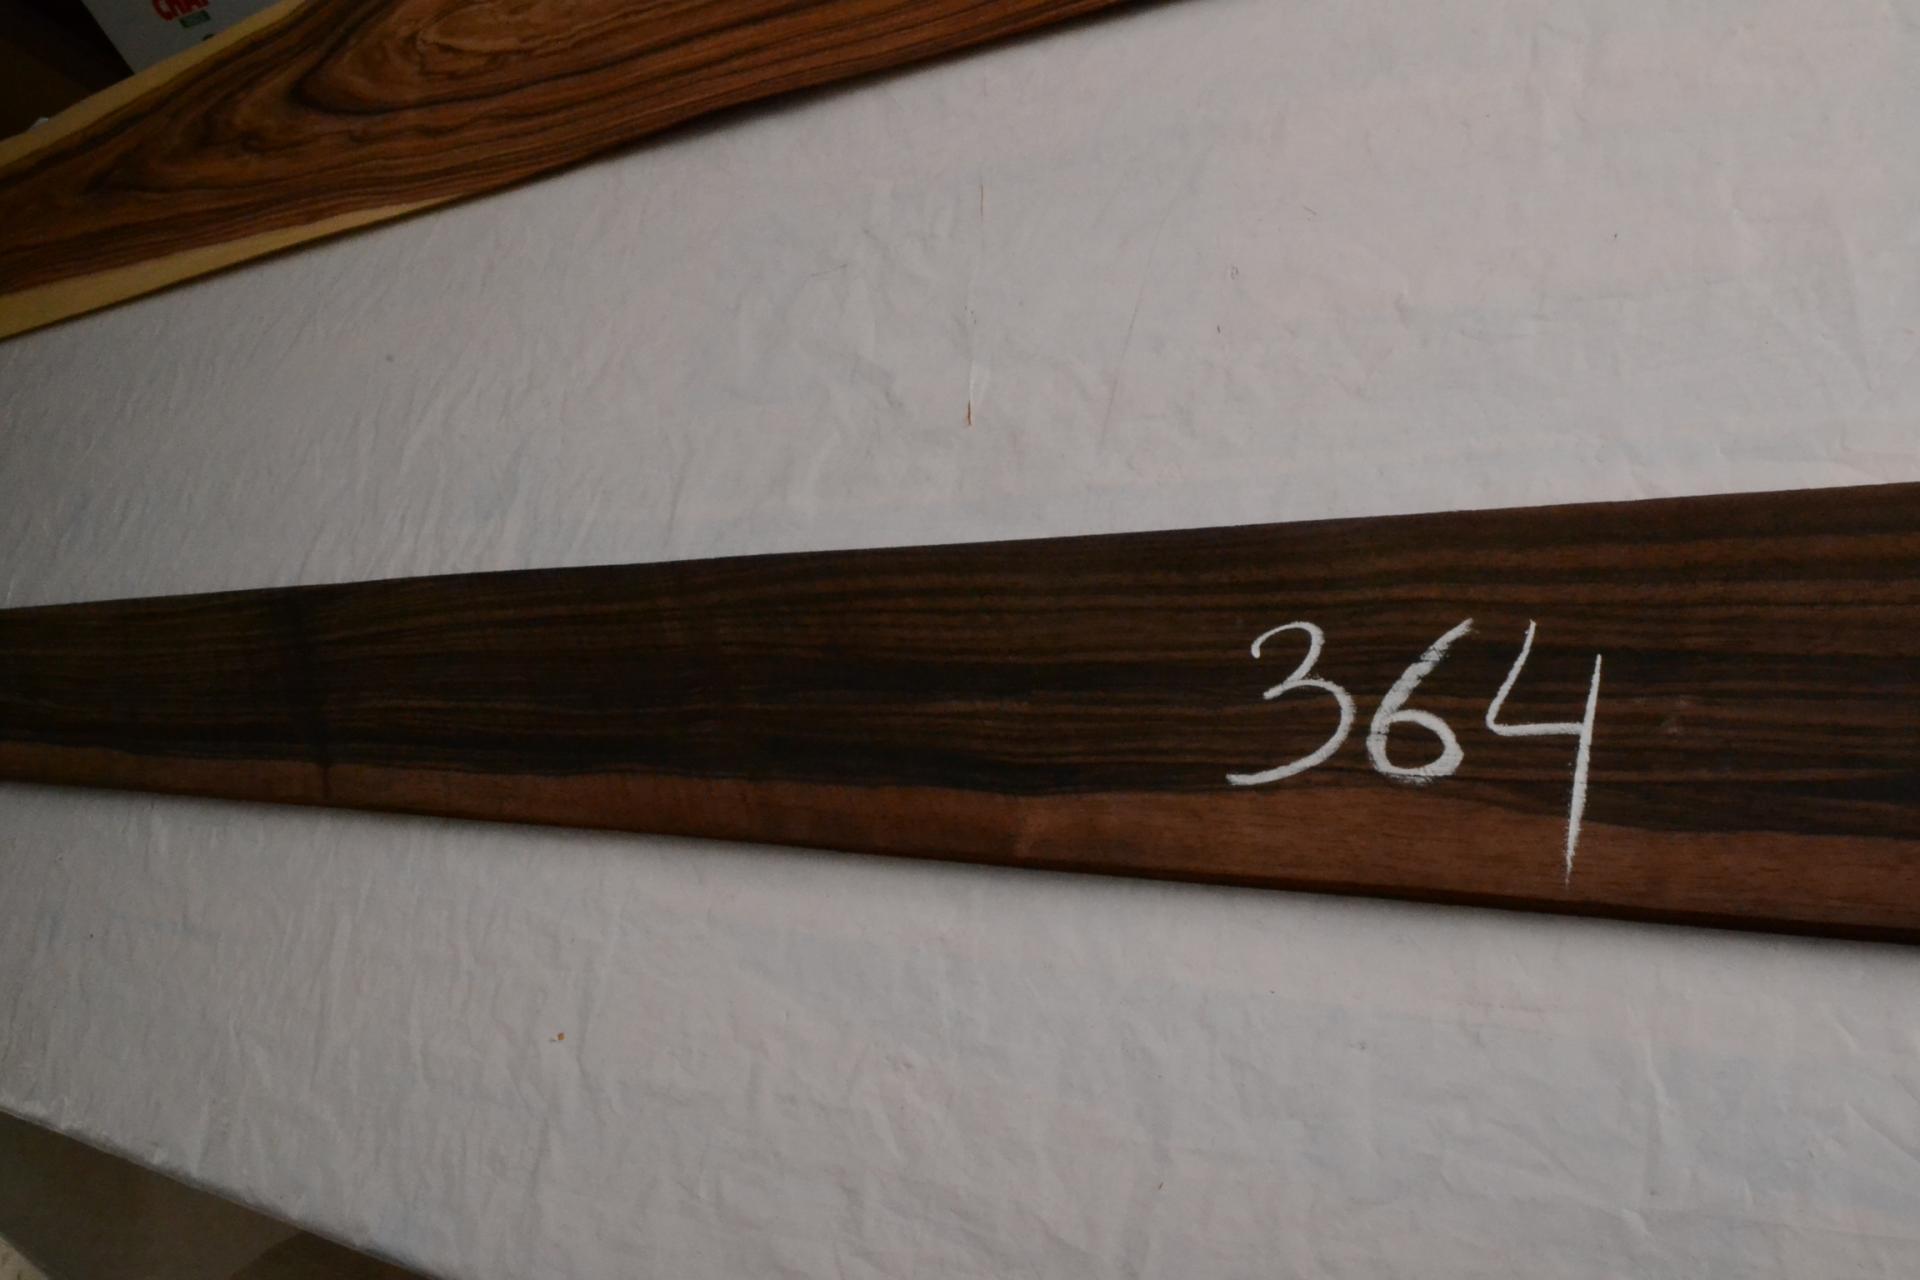 364 placage marqueterie ebene de macassar 1